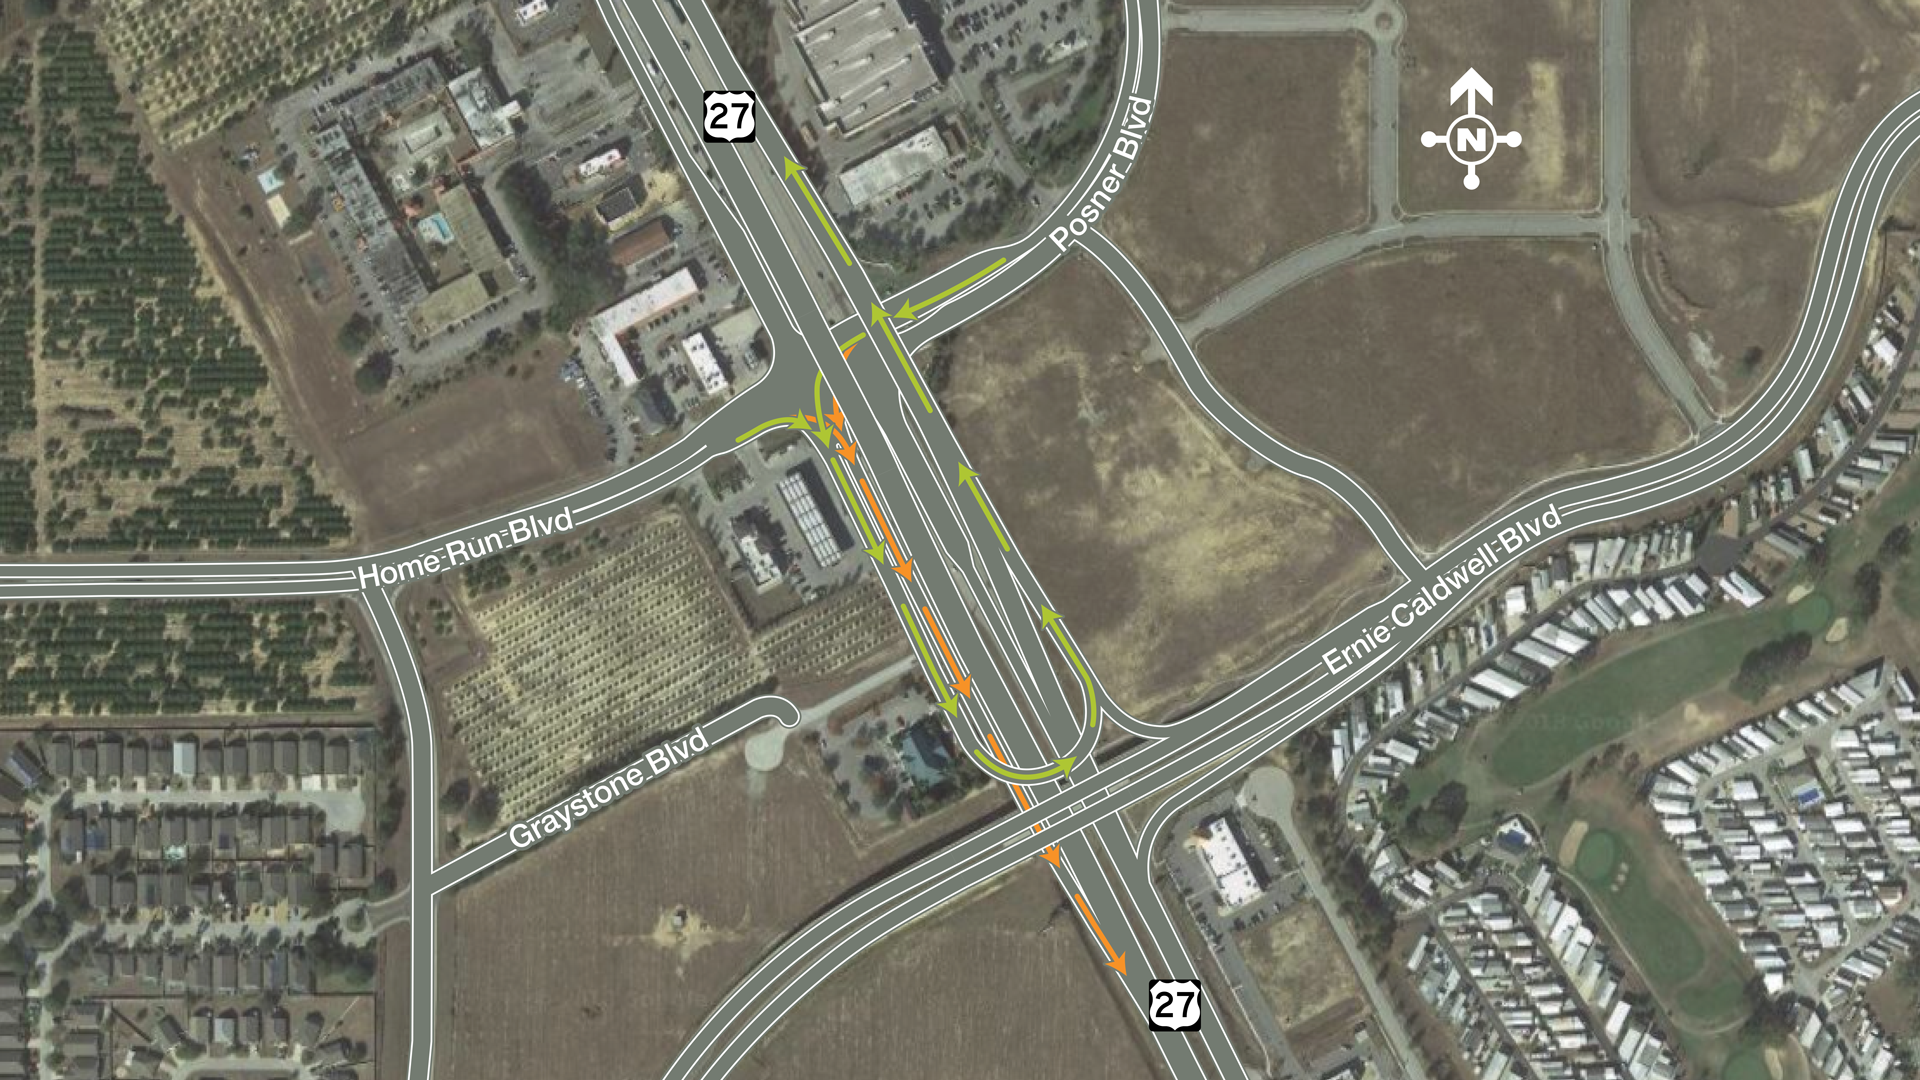 3388-US-27-Posner-Blvd-Interchange-Rendering